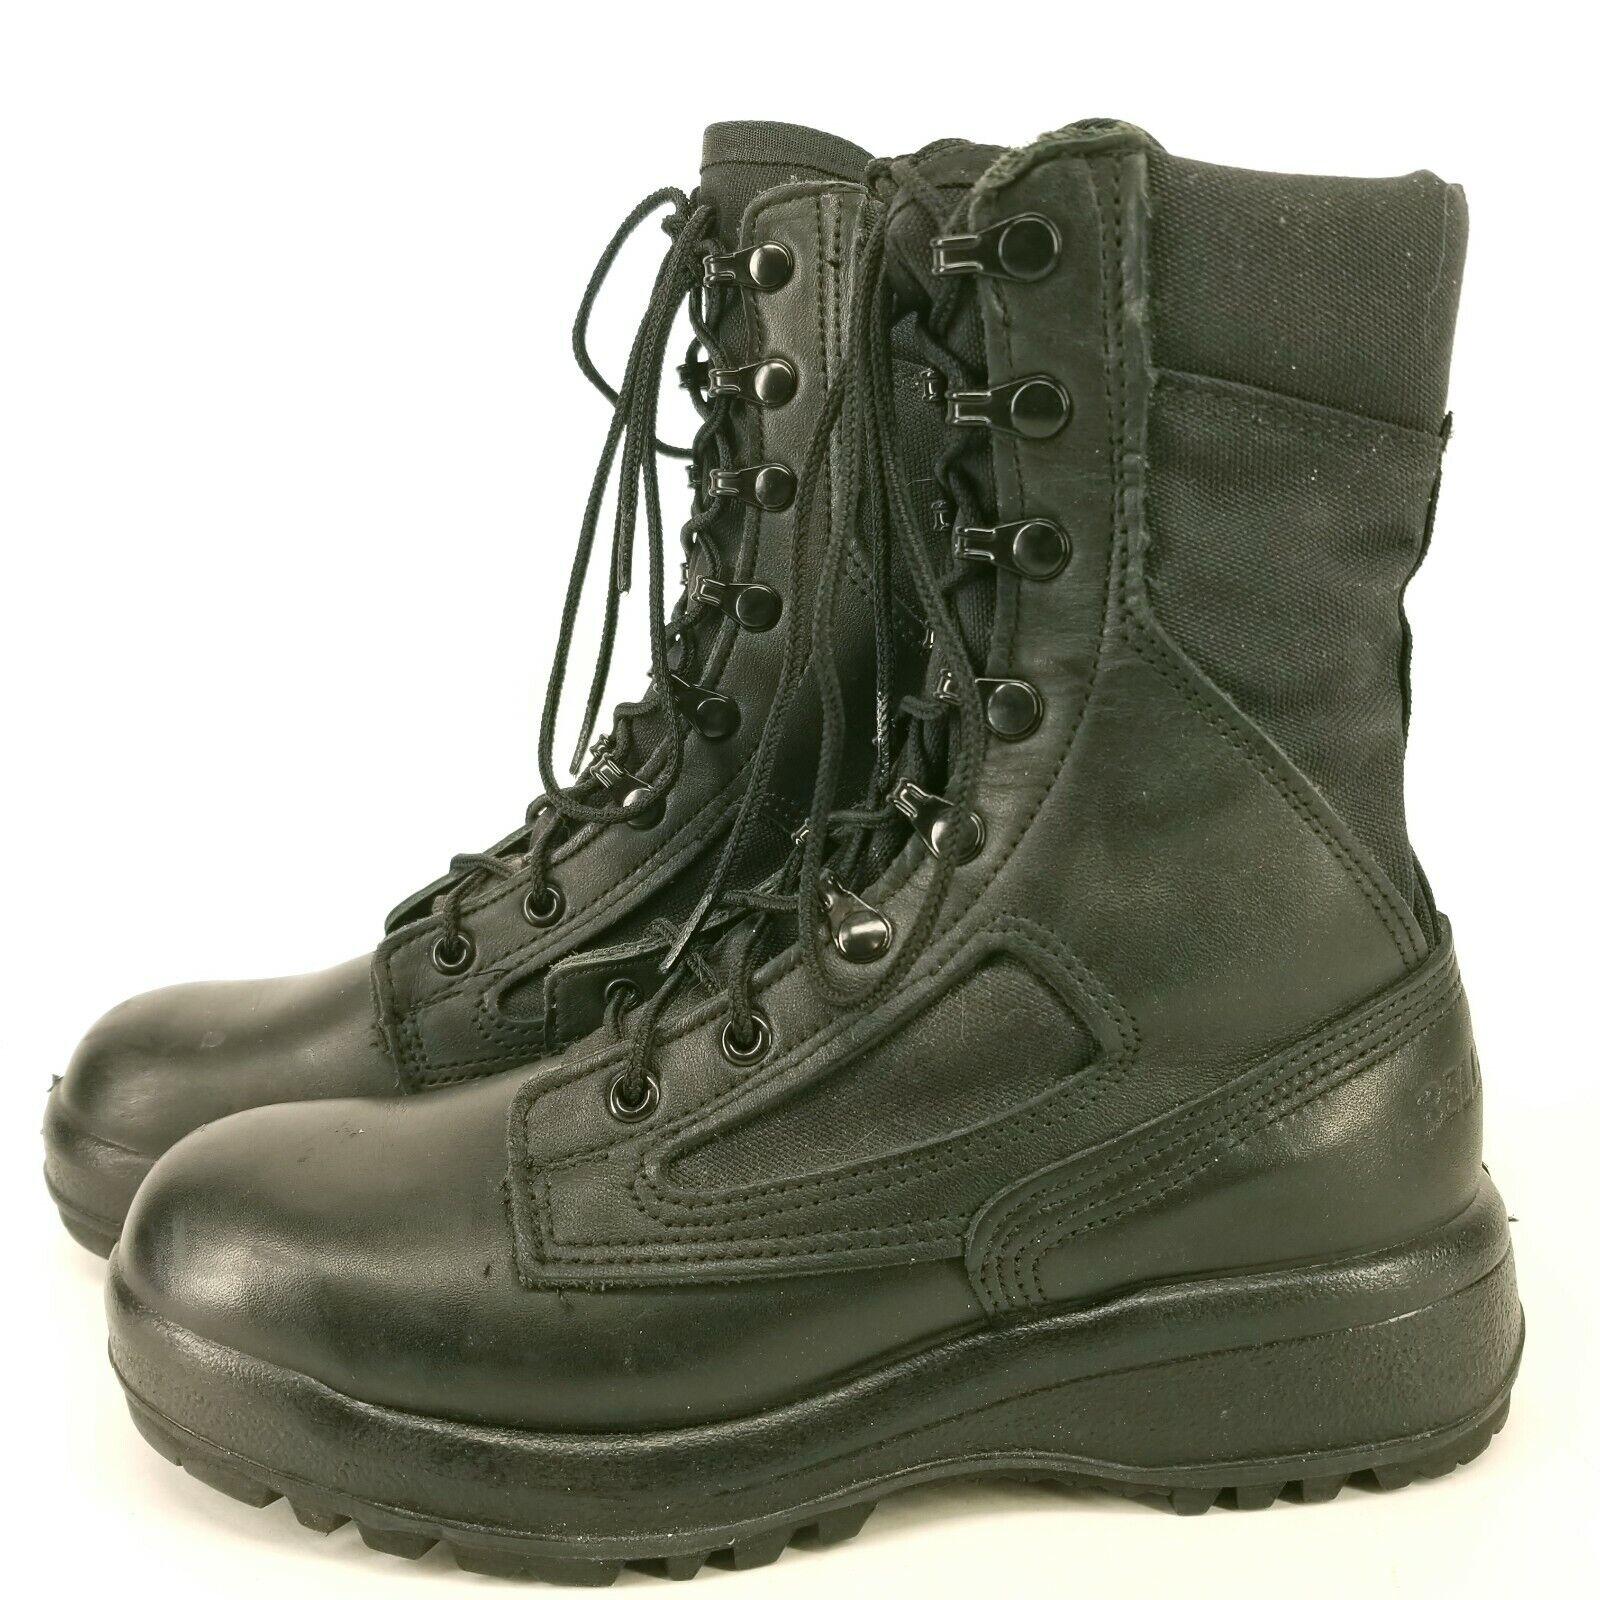 Belleville 390 TRP Mens 5.5 Tropical Hot Weather Boots Black